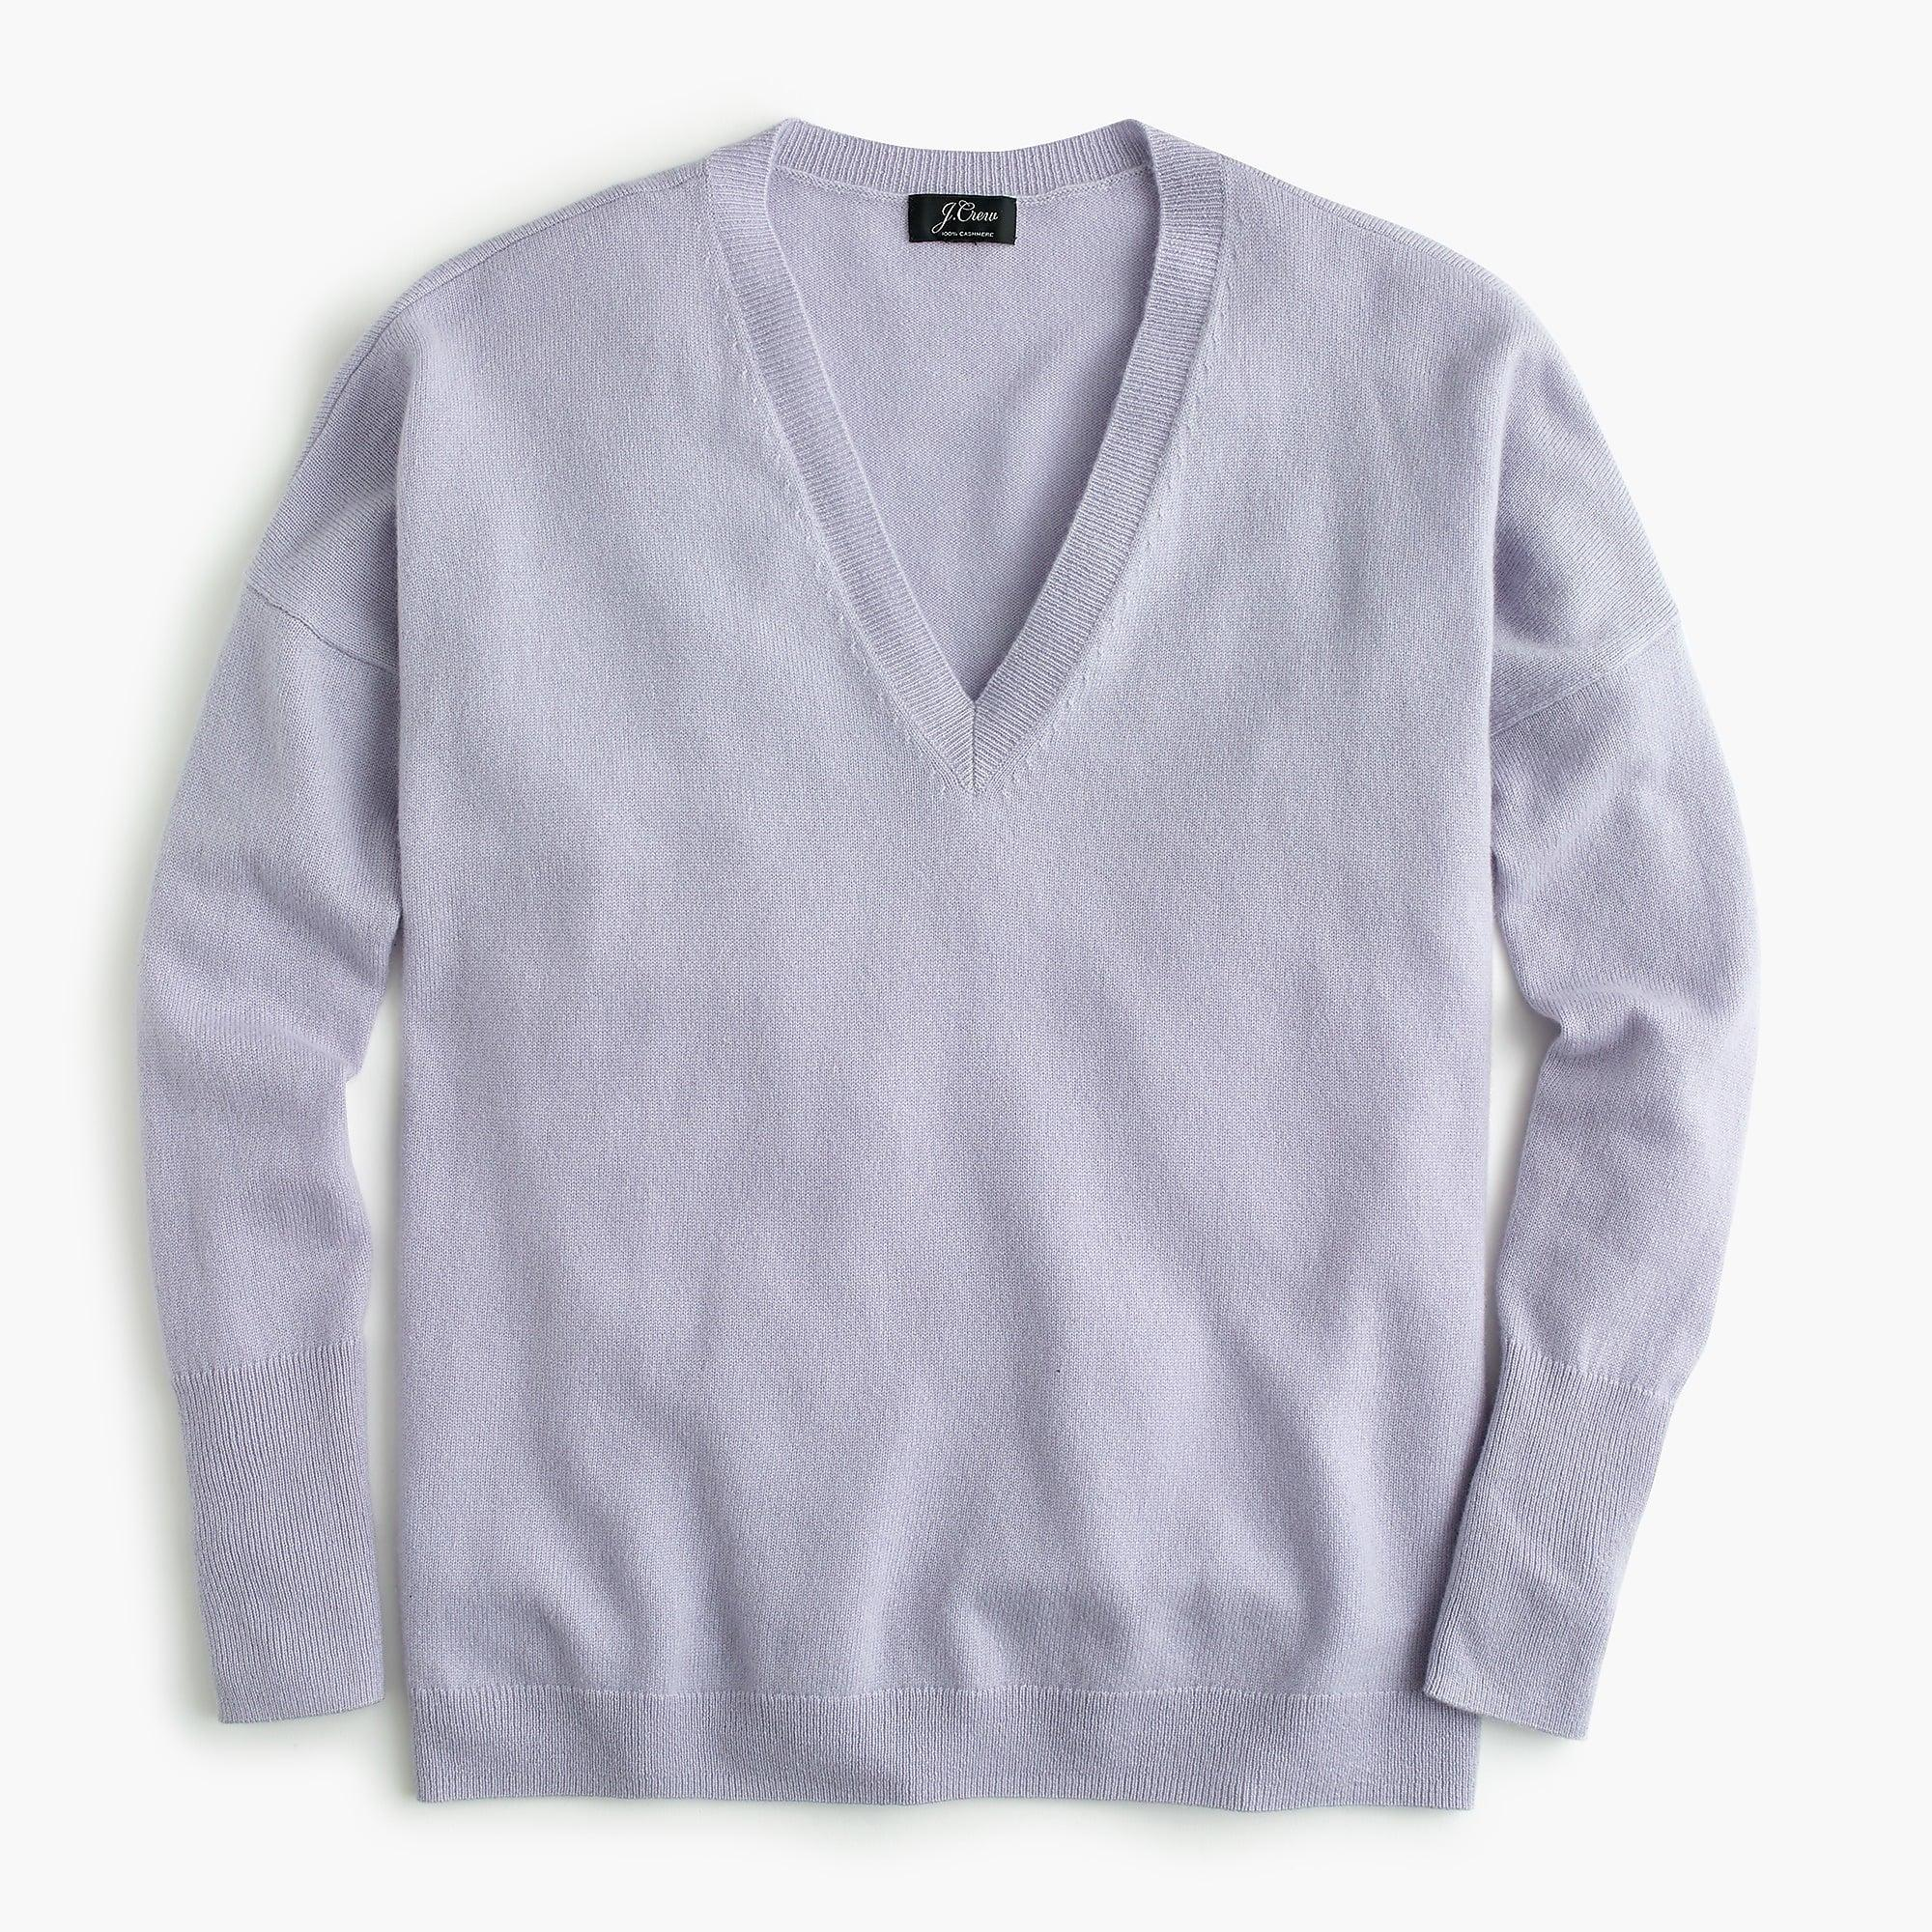 39ae4d715e6a Lyst - J.Crew V-neck Boyfriend Sweater In Everyday Cashmere